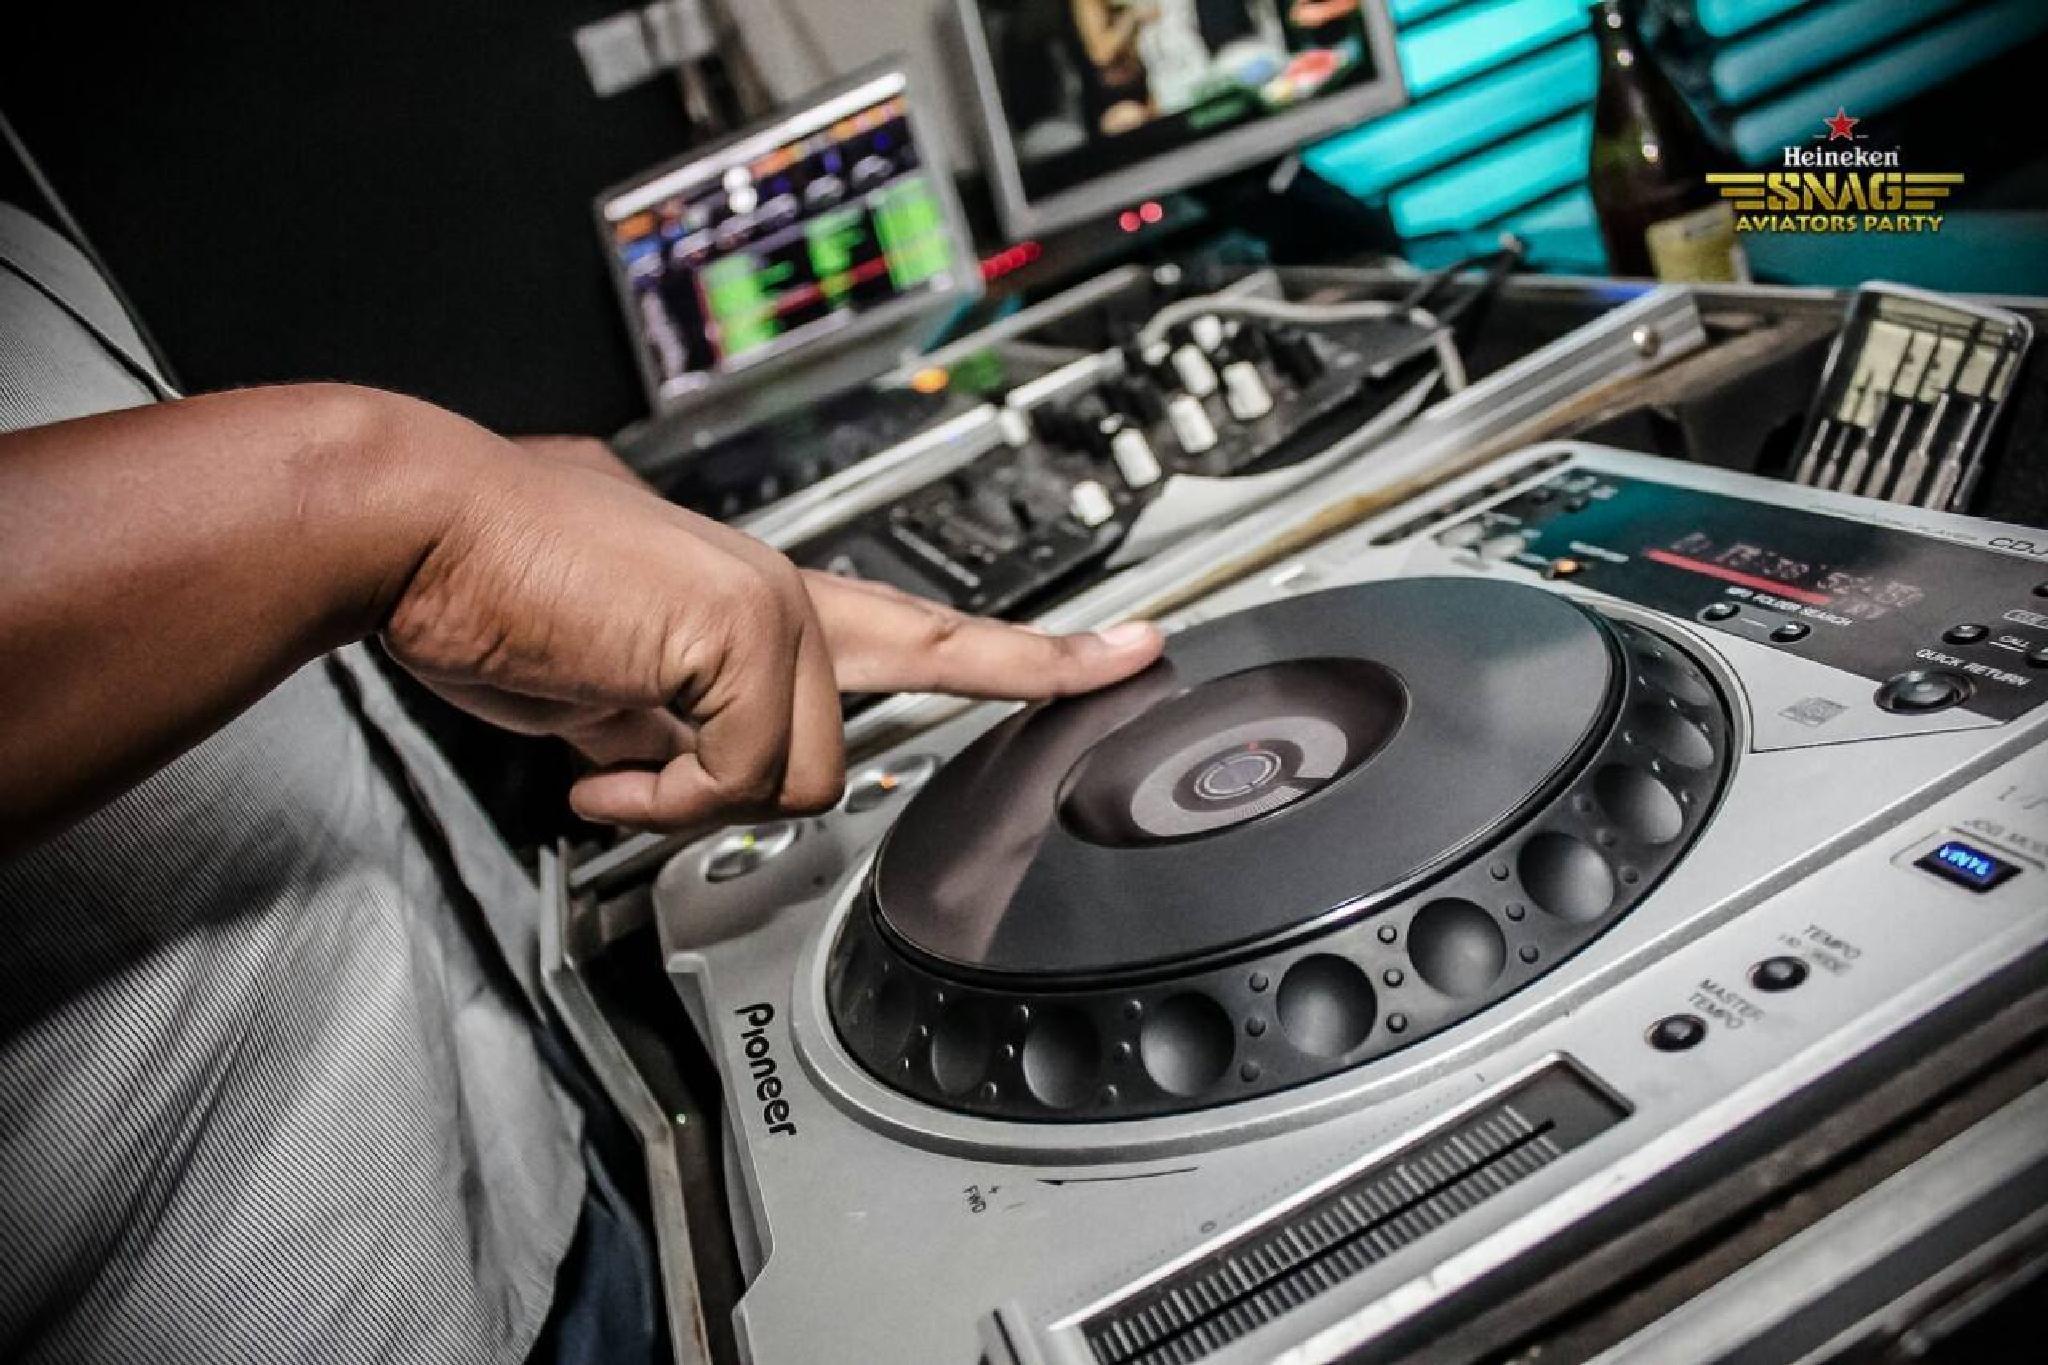 DJ STRETCH ON THE DECKS by eugene.kaiga